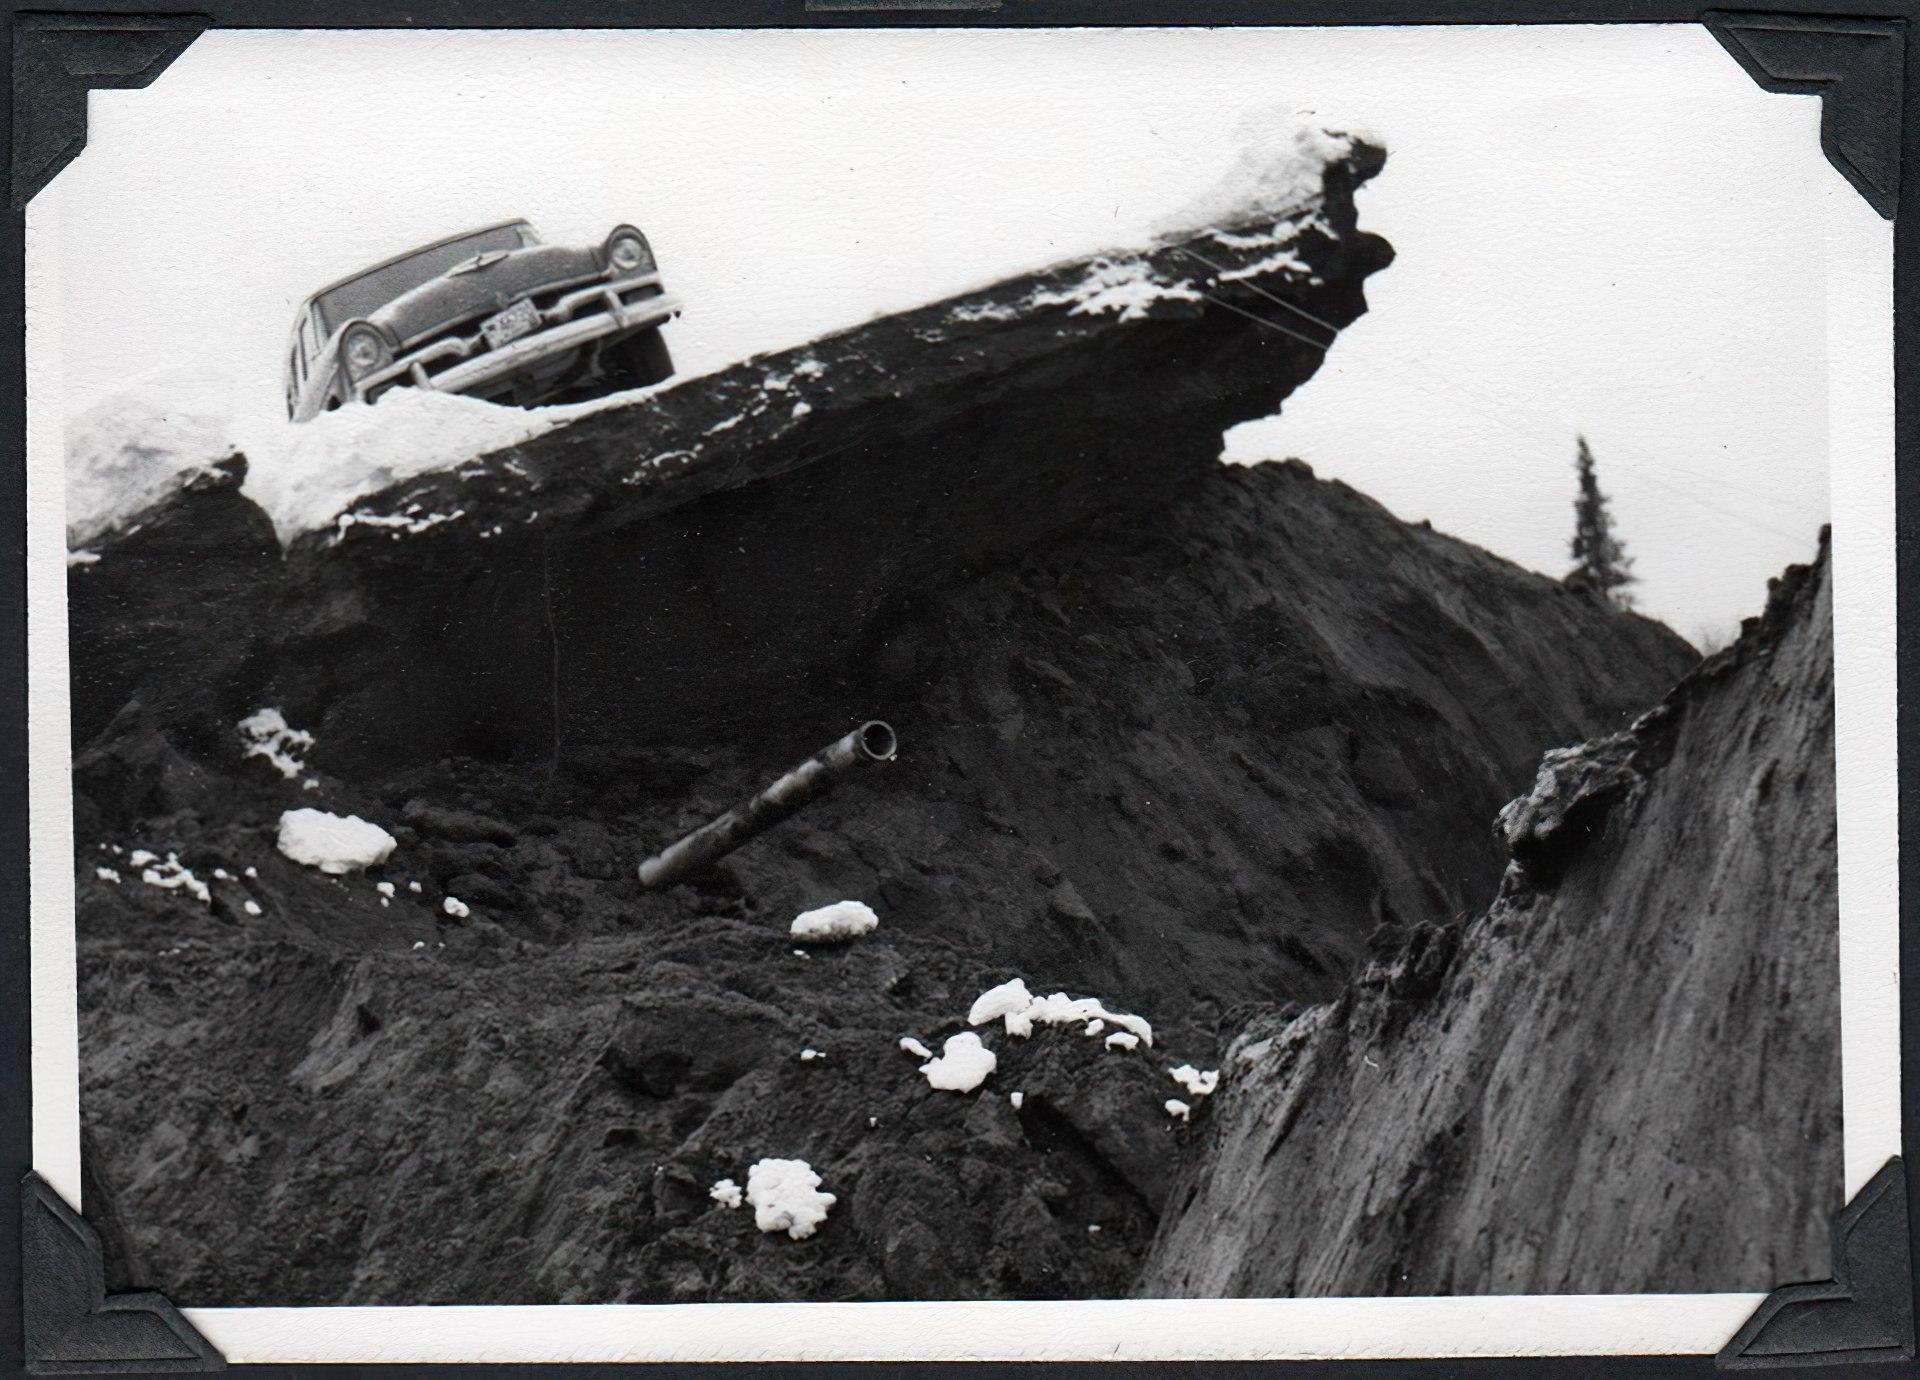 Car sitting on top of earthquake damage 1964 Anchorage, Alaska